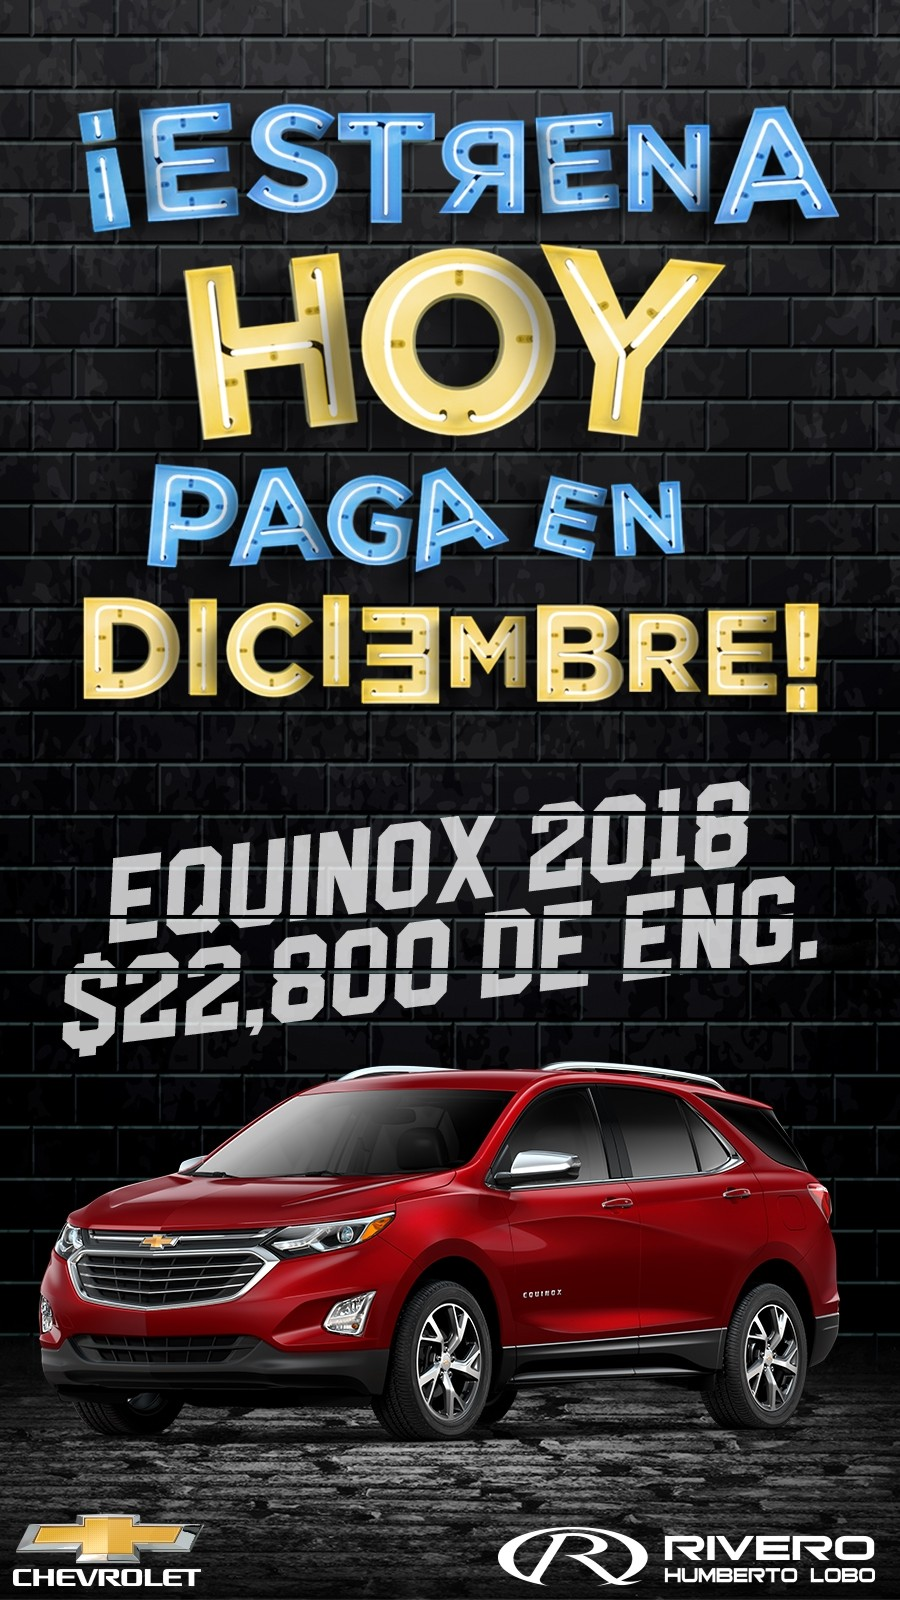 Chevrolet Grupo Rivero Equinox 2018 En Monterrey